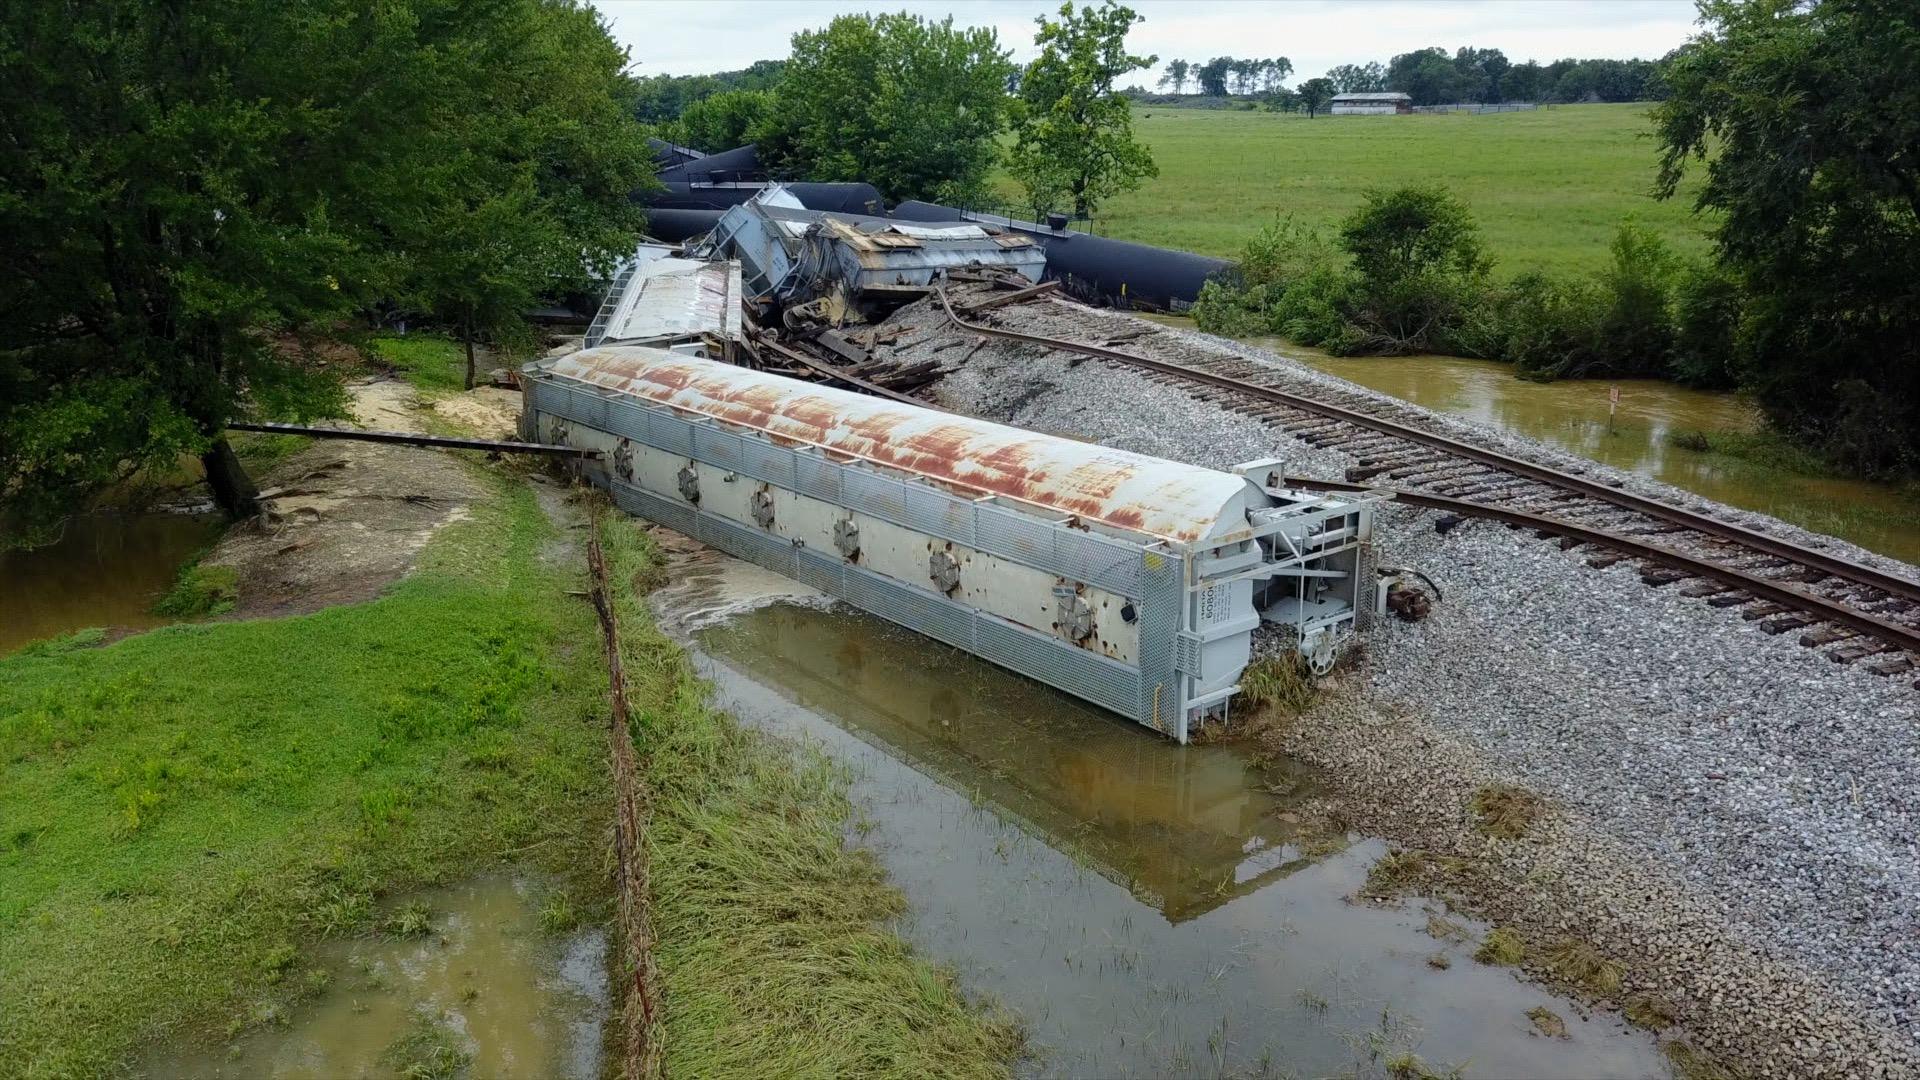 SKY5 Sequoyah County train derailment